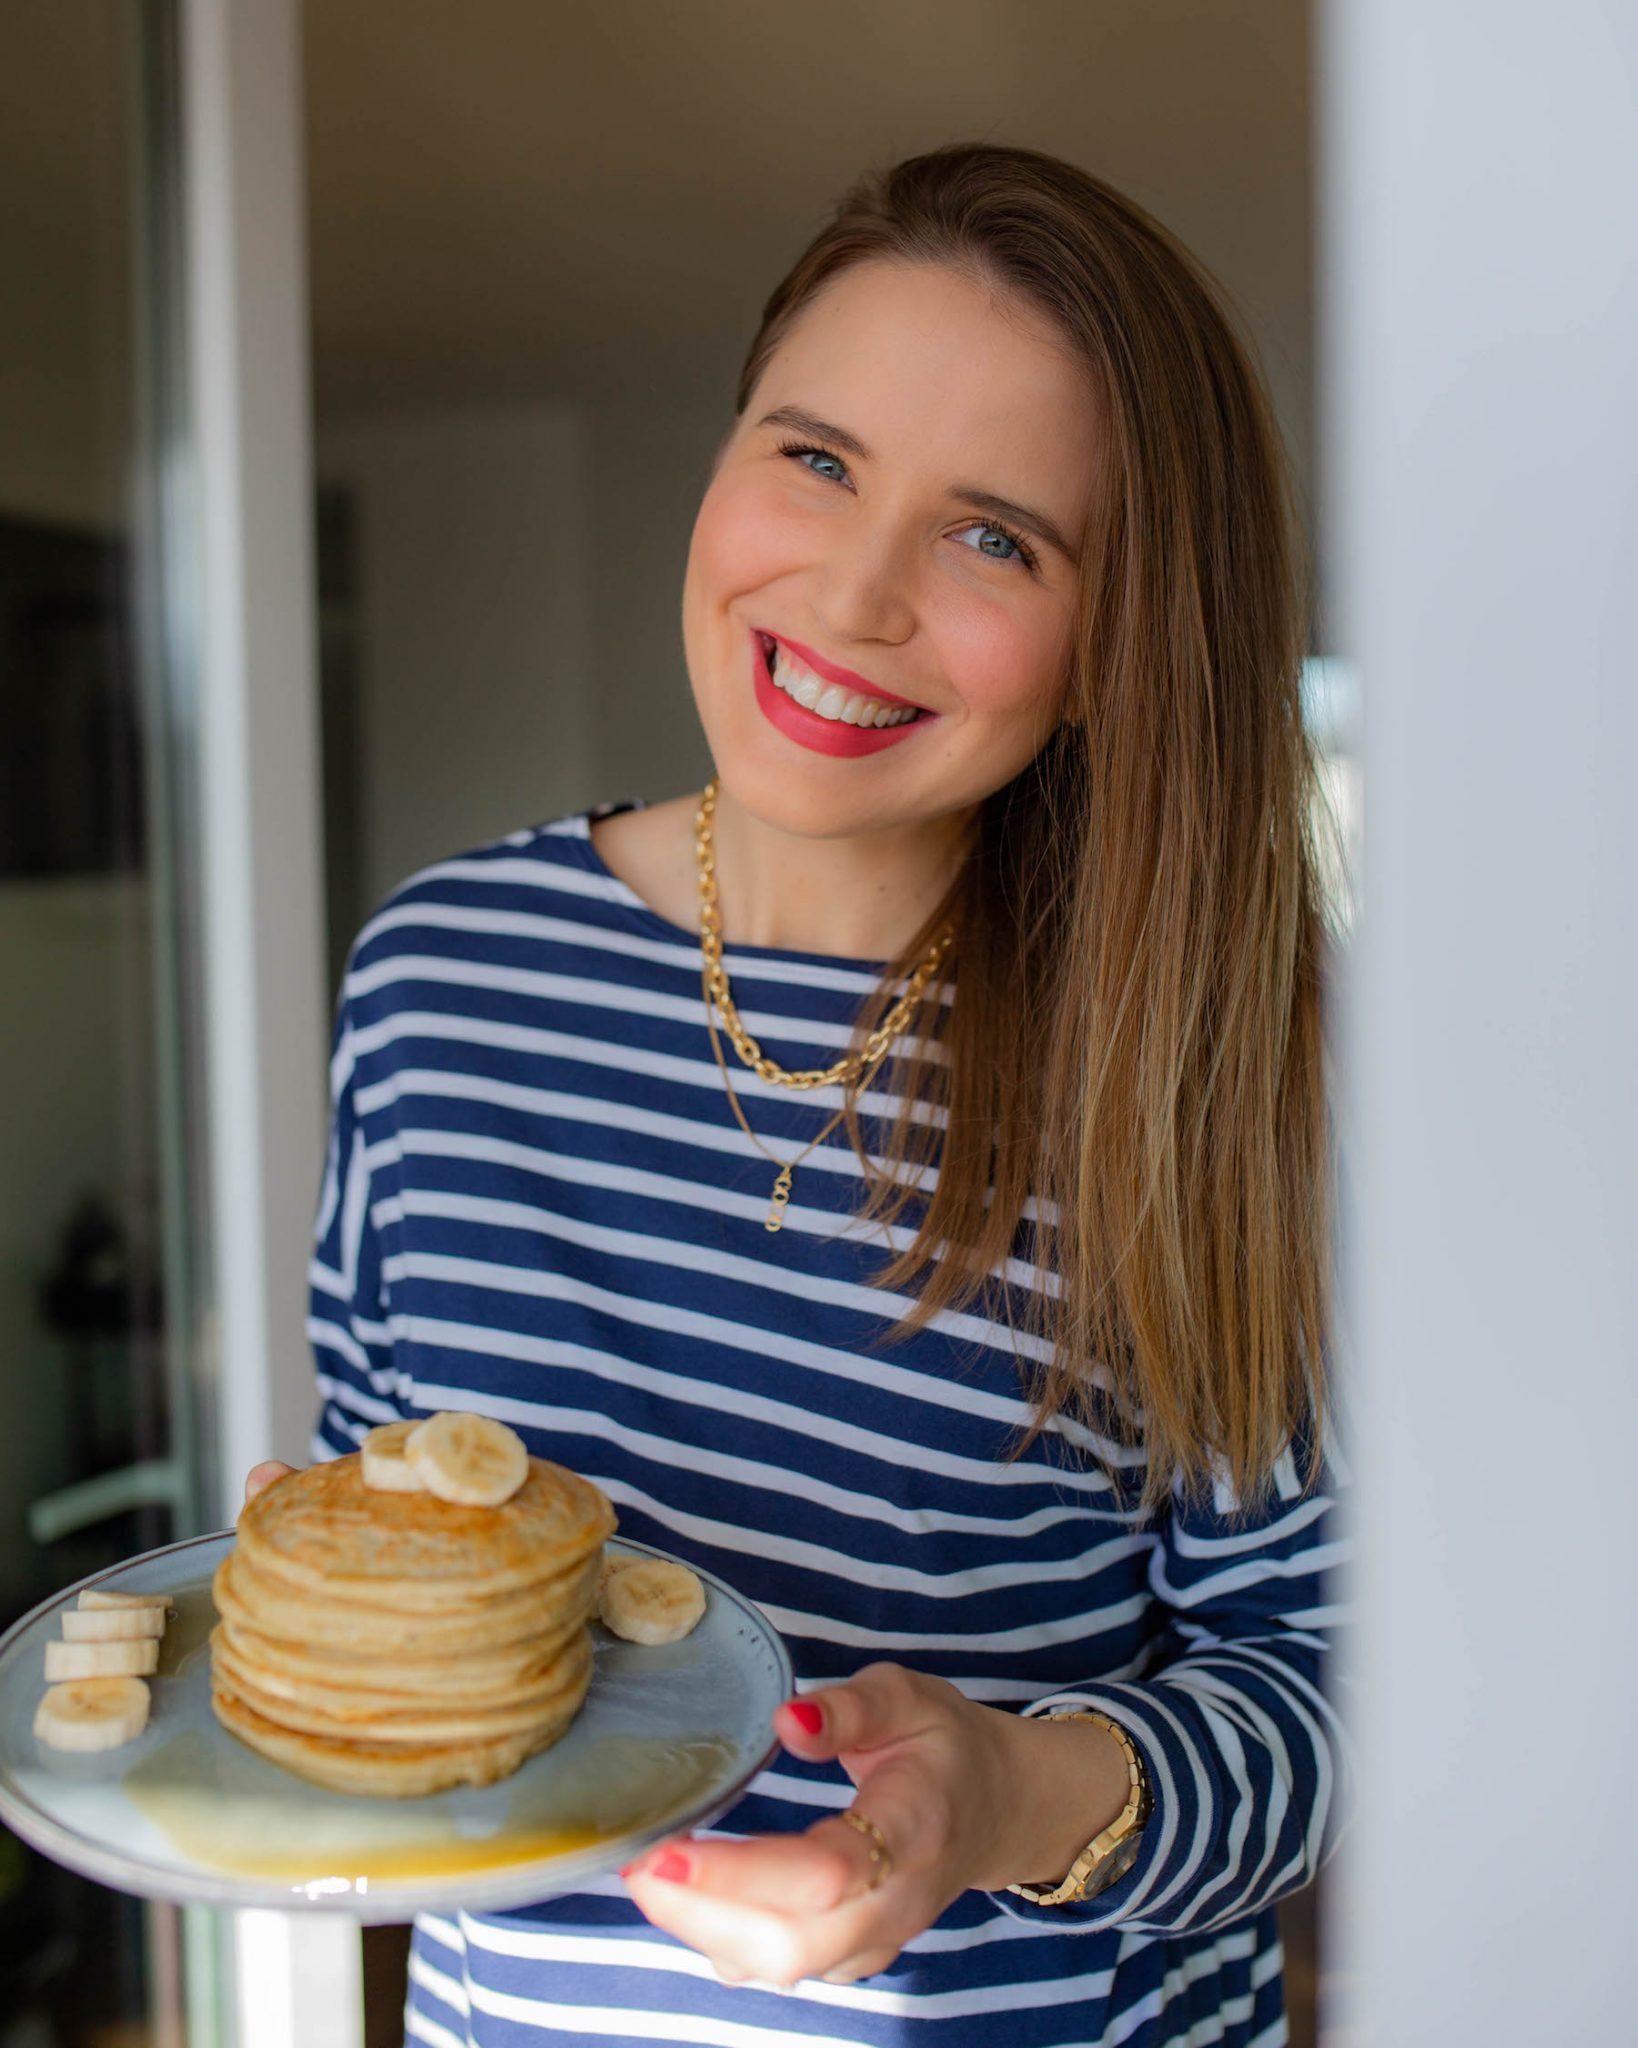 suelovesnyc_schaer_banana_pancakes_glutenfreie_bananen_pancakes_rezept_glutenfrei_4